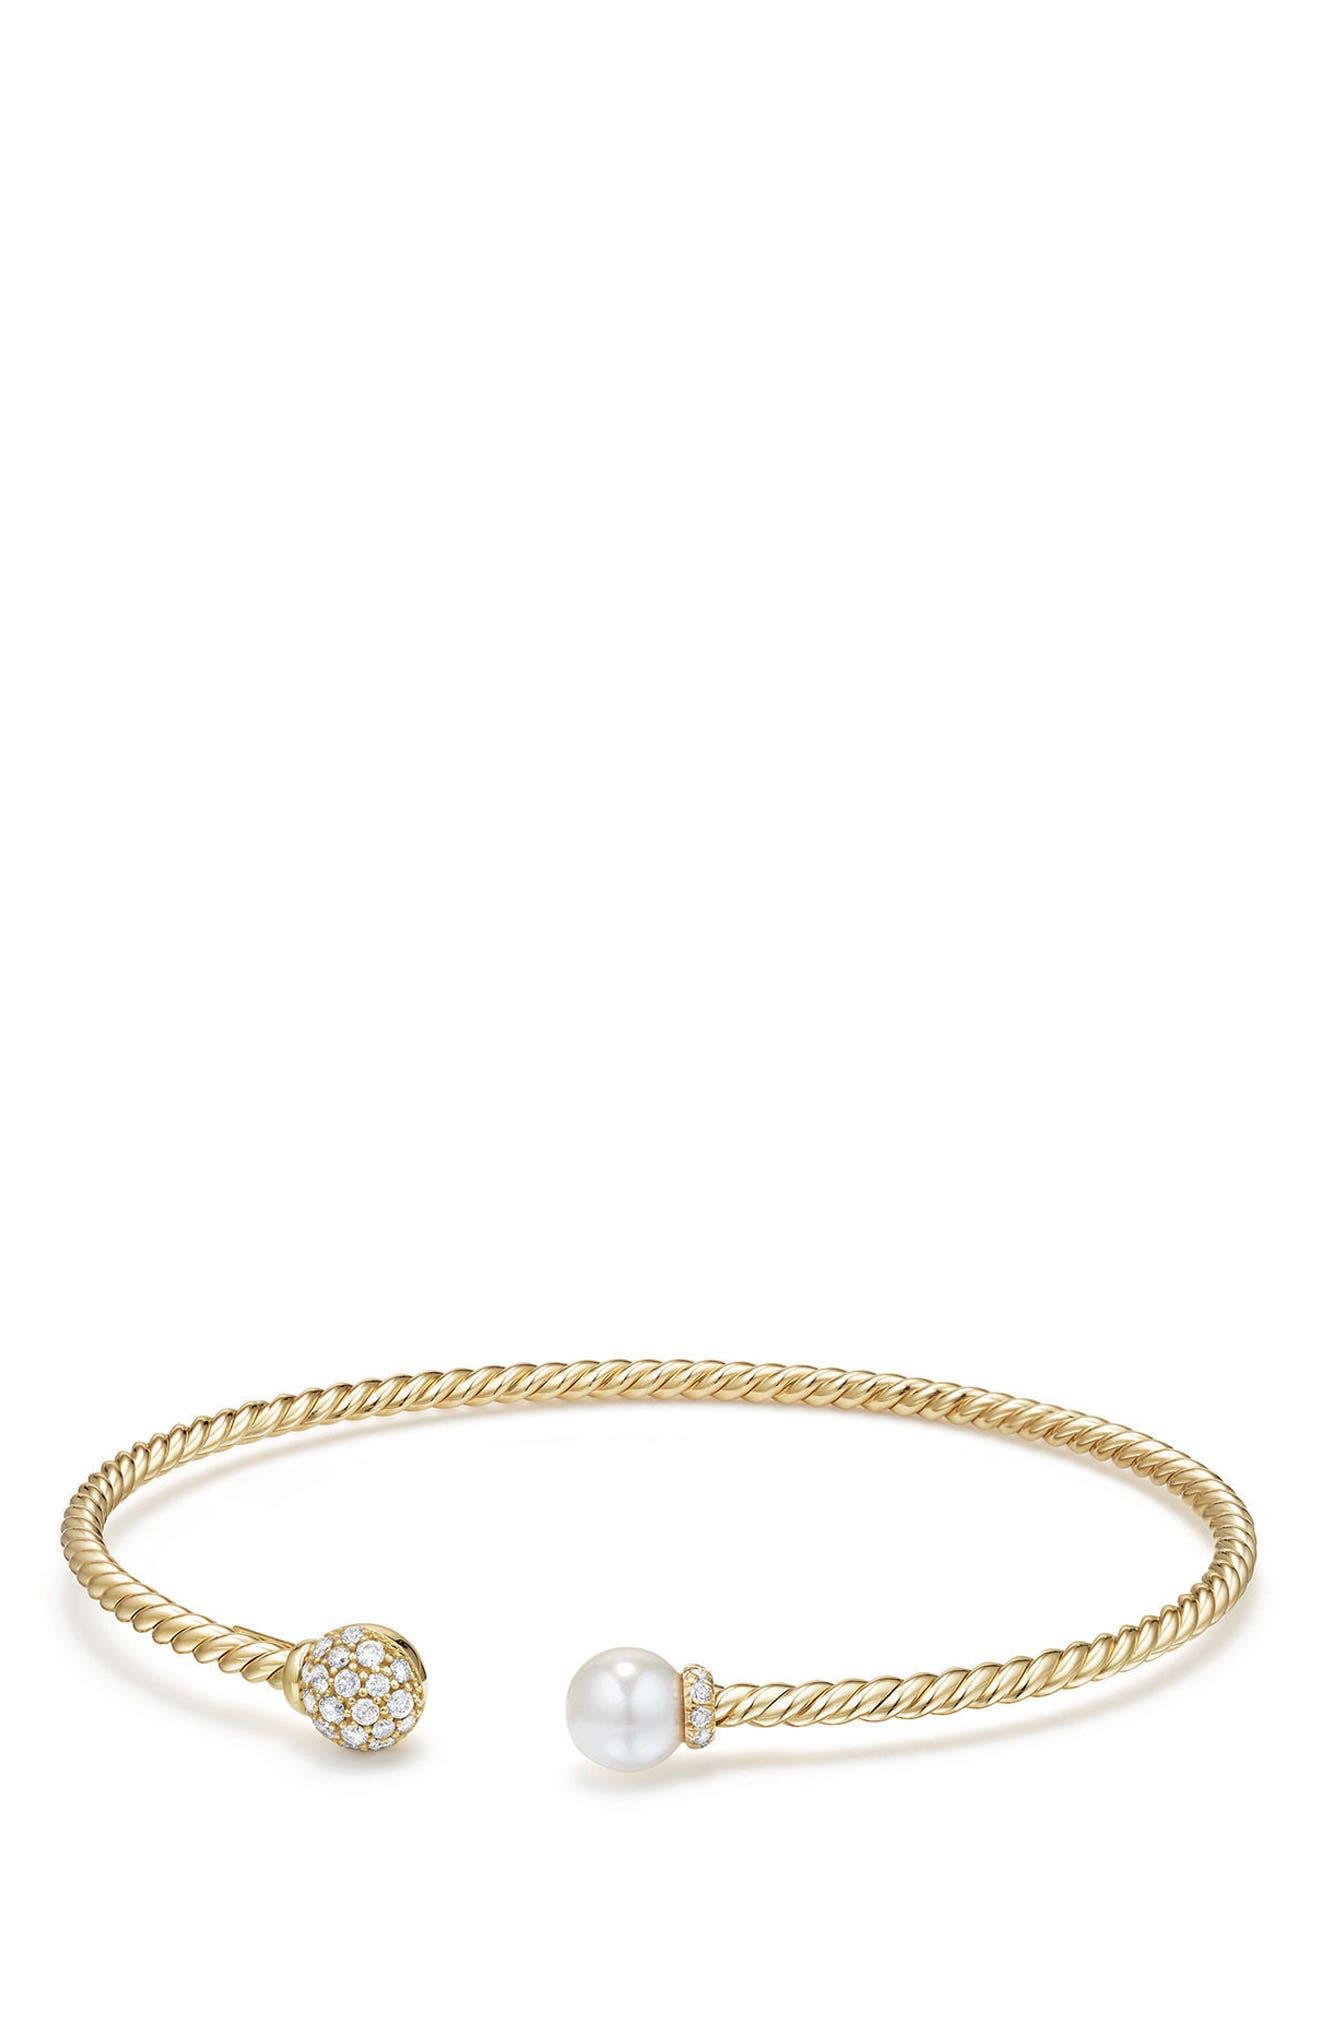 Solari Bead & Pearl Bracelet with Diamonds in 18K Gold,                             Main thumbnail 1, color,                             Yellow Gold/ Diamond/ Pearl